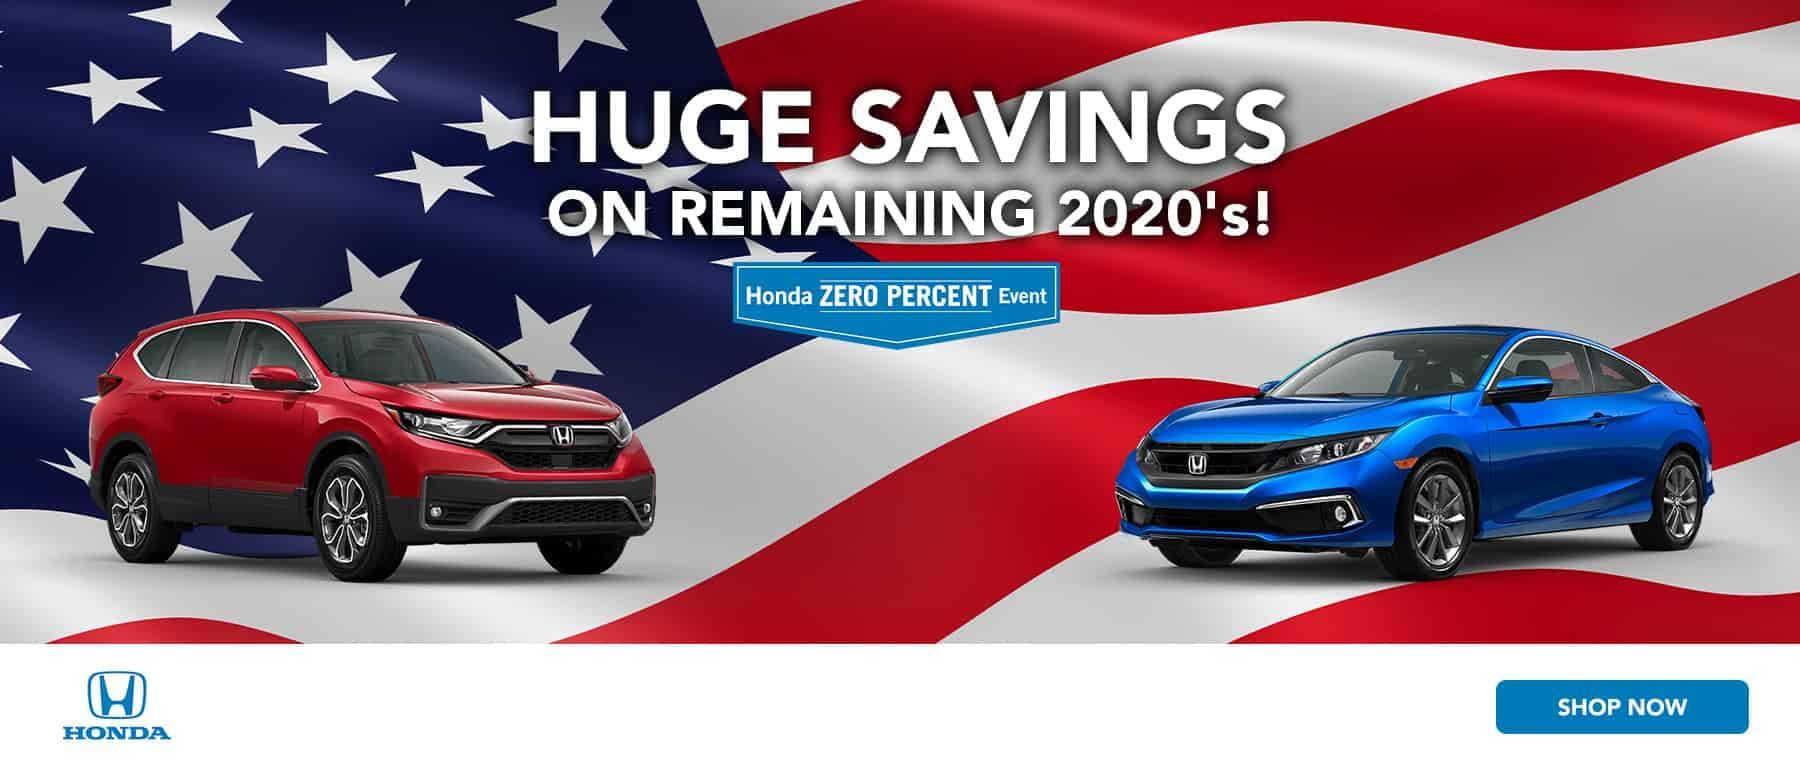 Huge Savings on Remaining 2020's